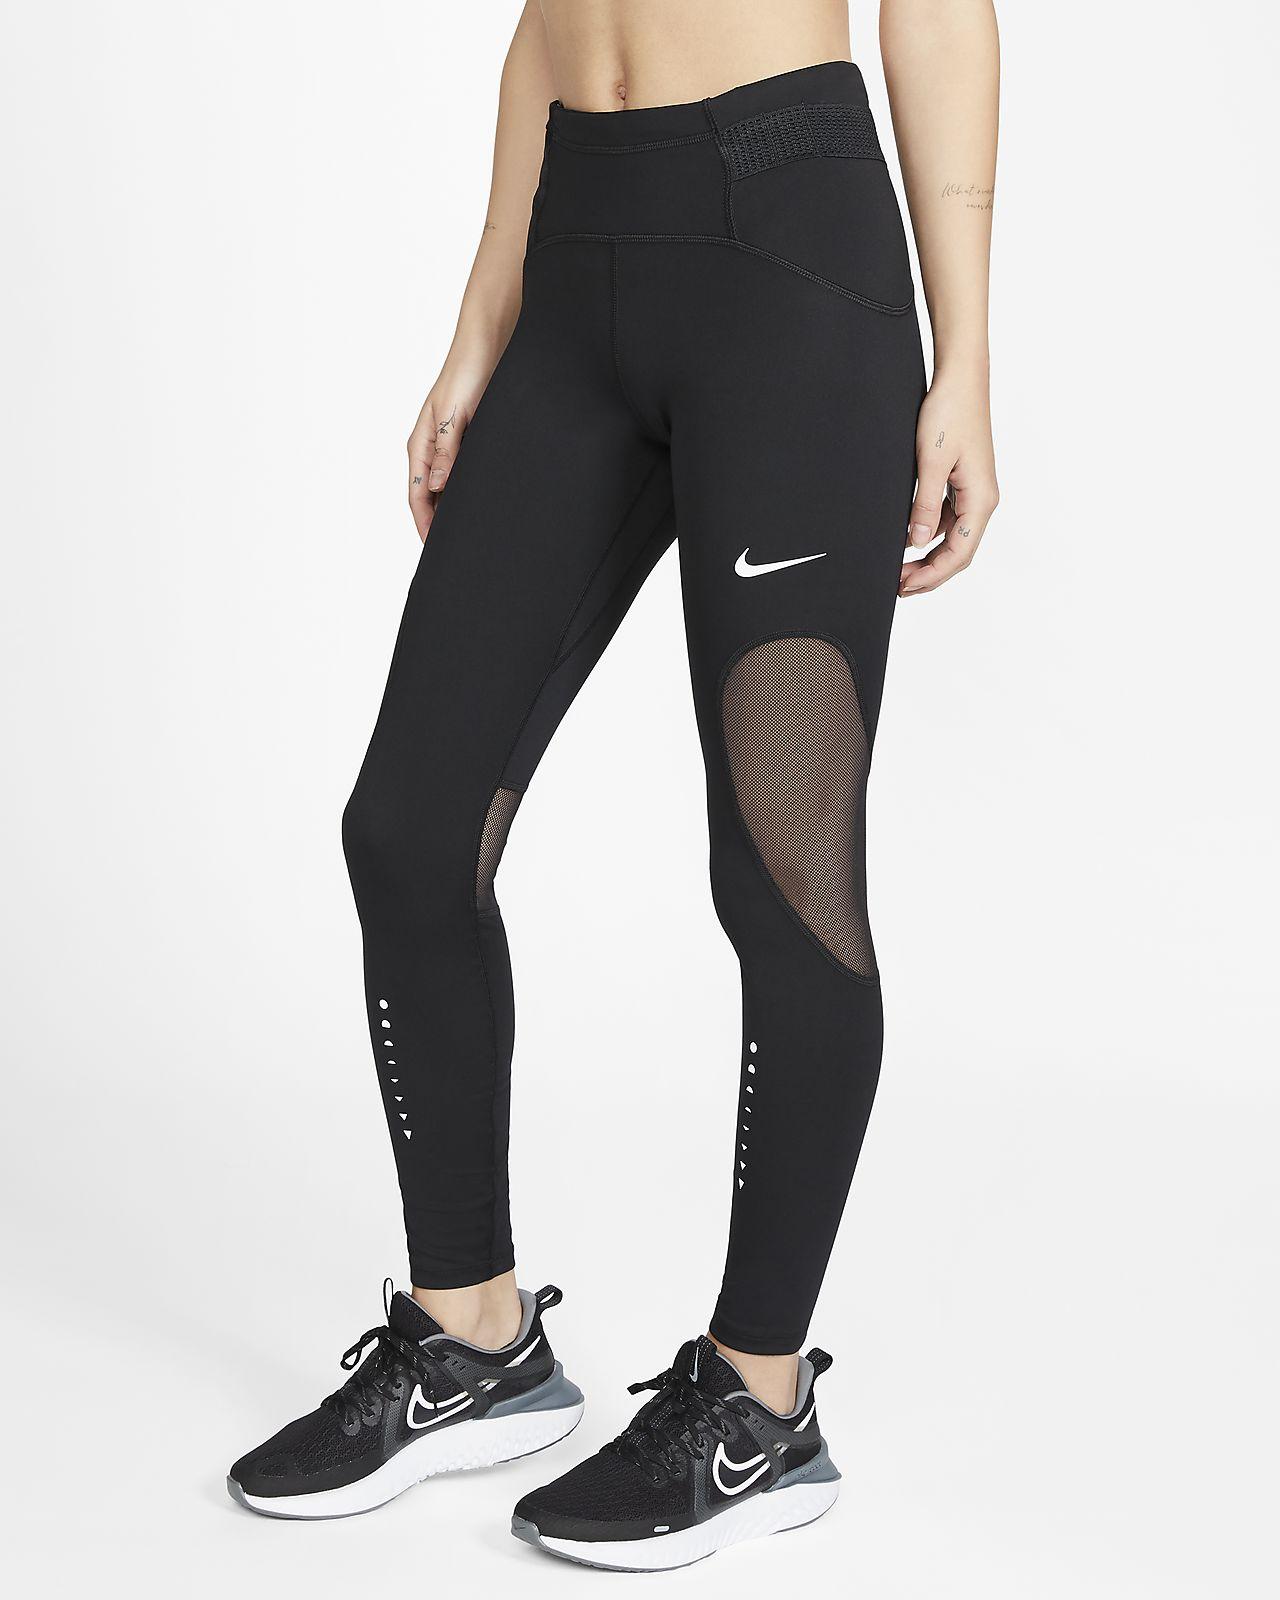 Nike Speed Icon Clash 7/8 Kadın Koşu Taytı